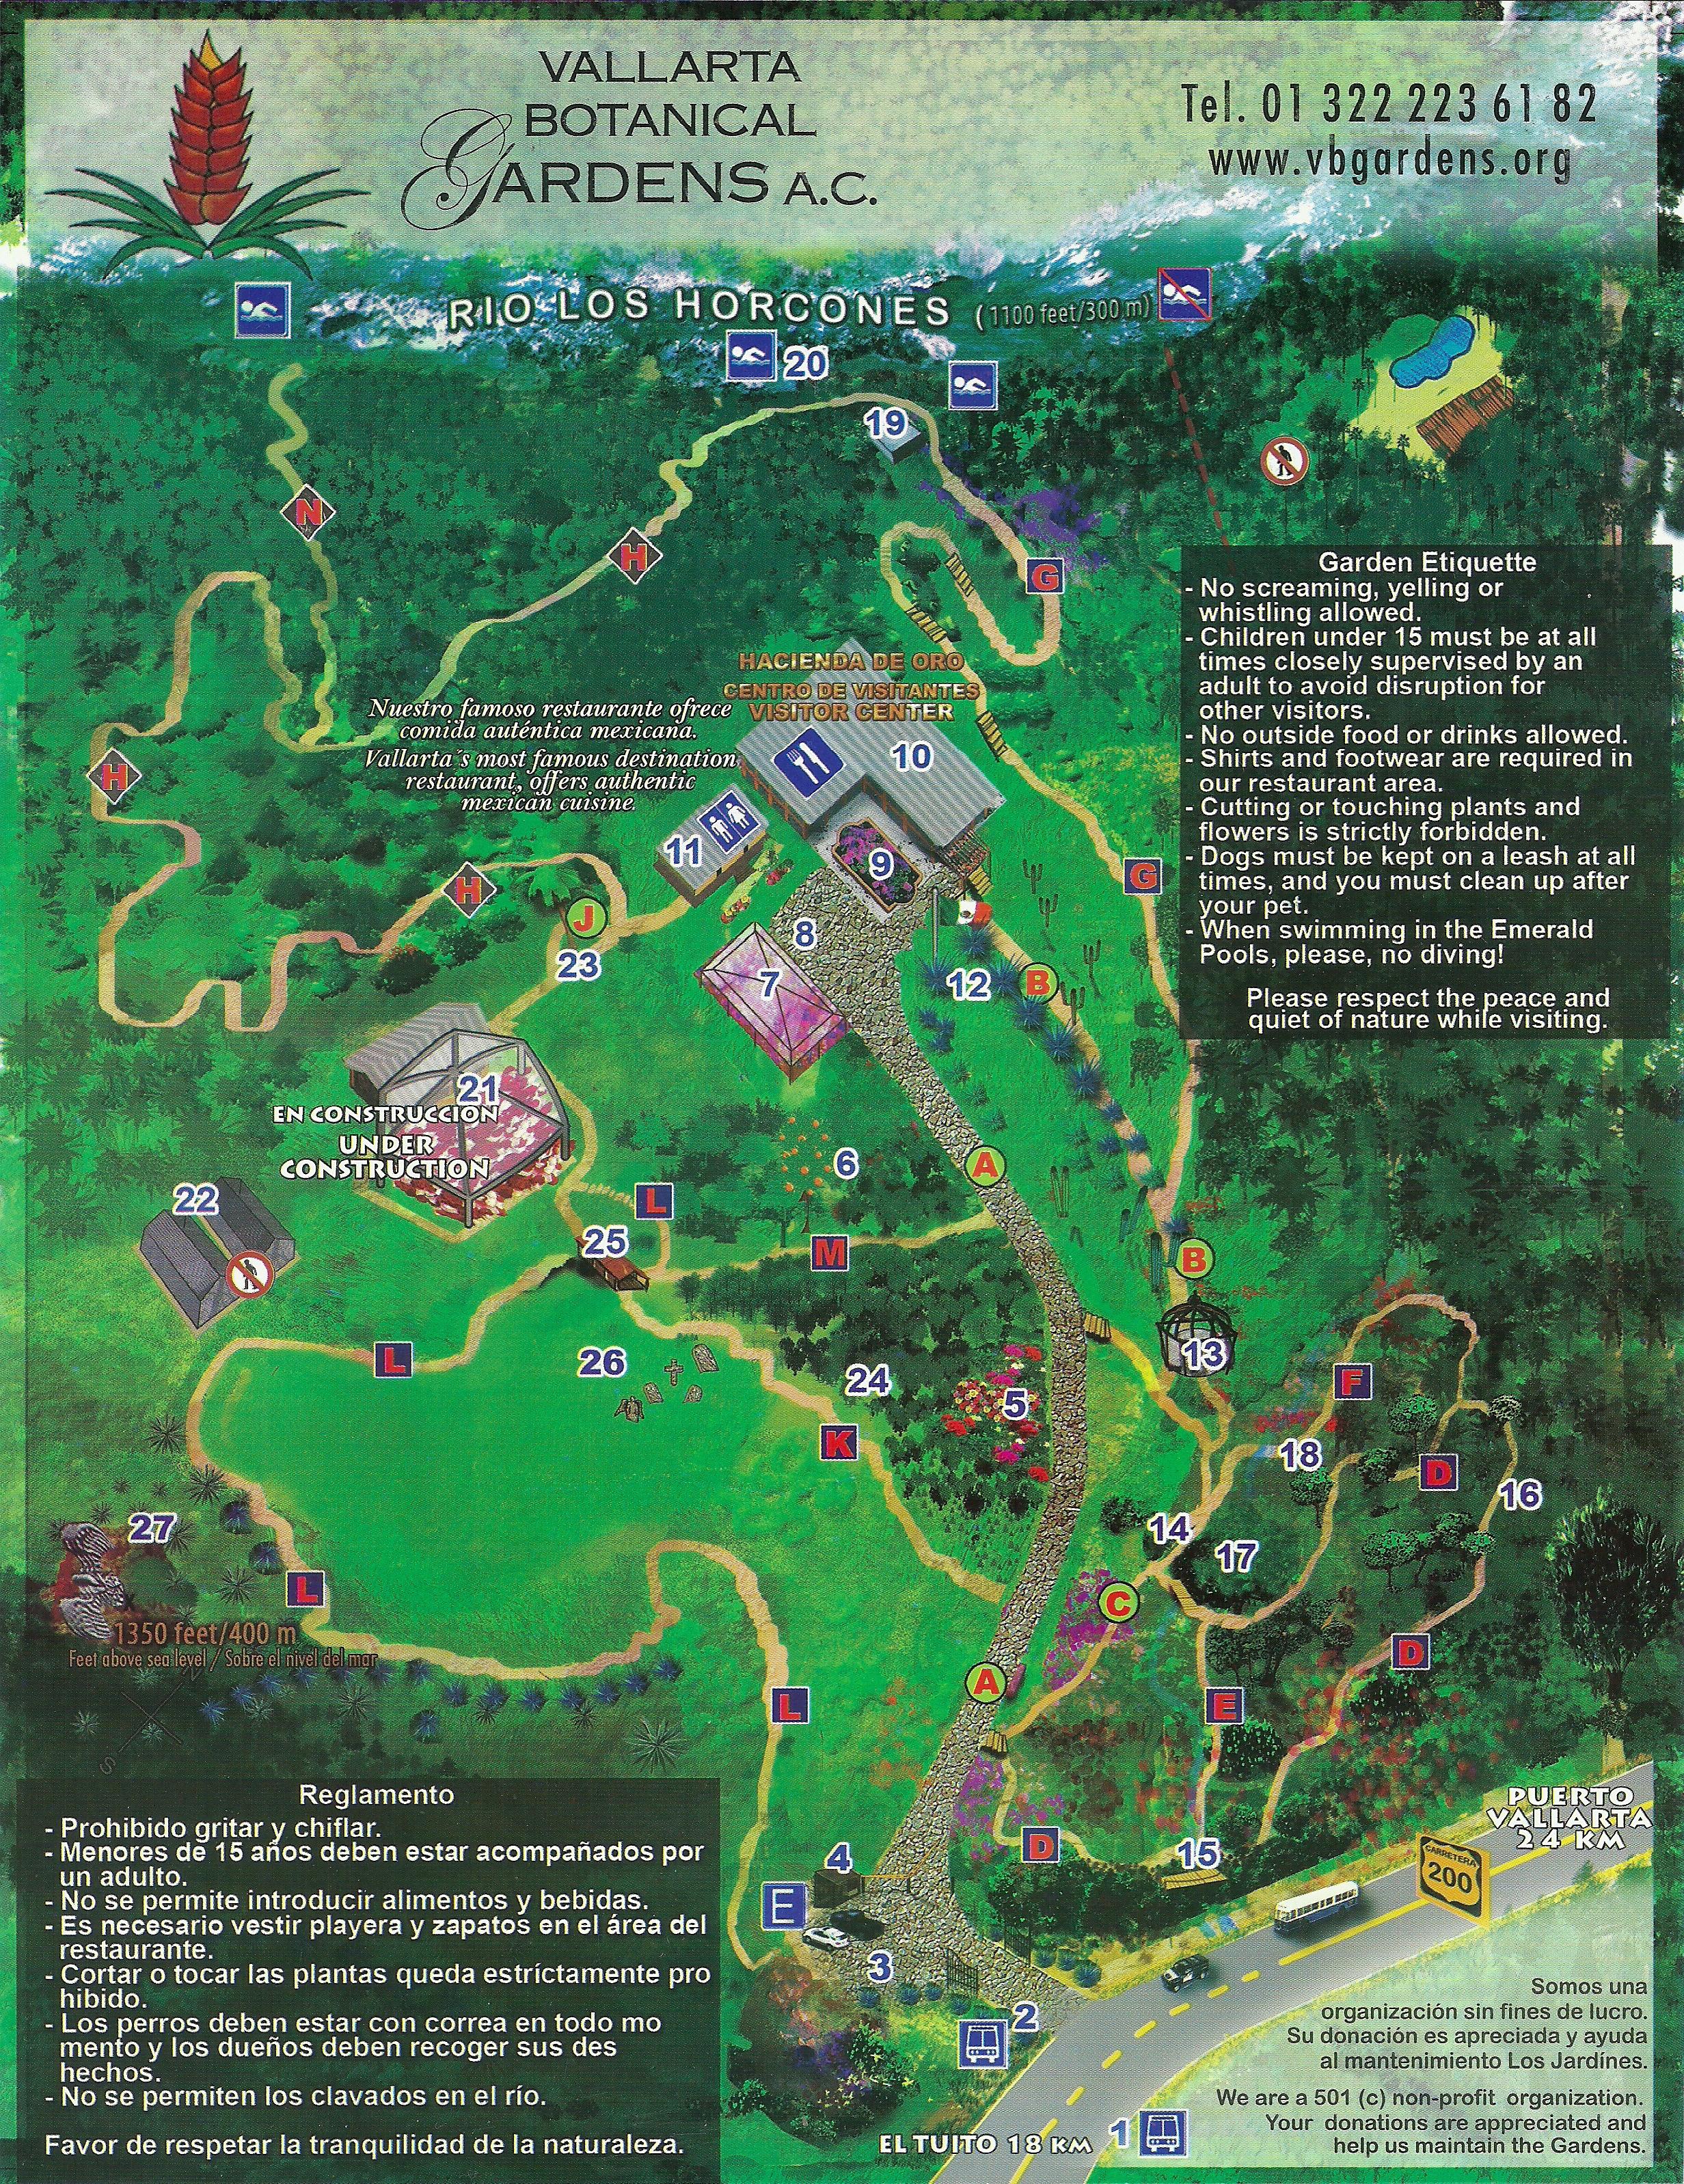 Exceptionnel Botanical Gardens Map, Puerto Vallarta, Mexico